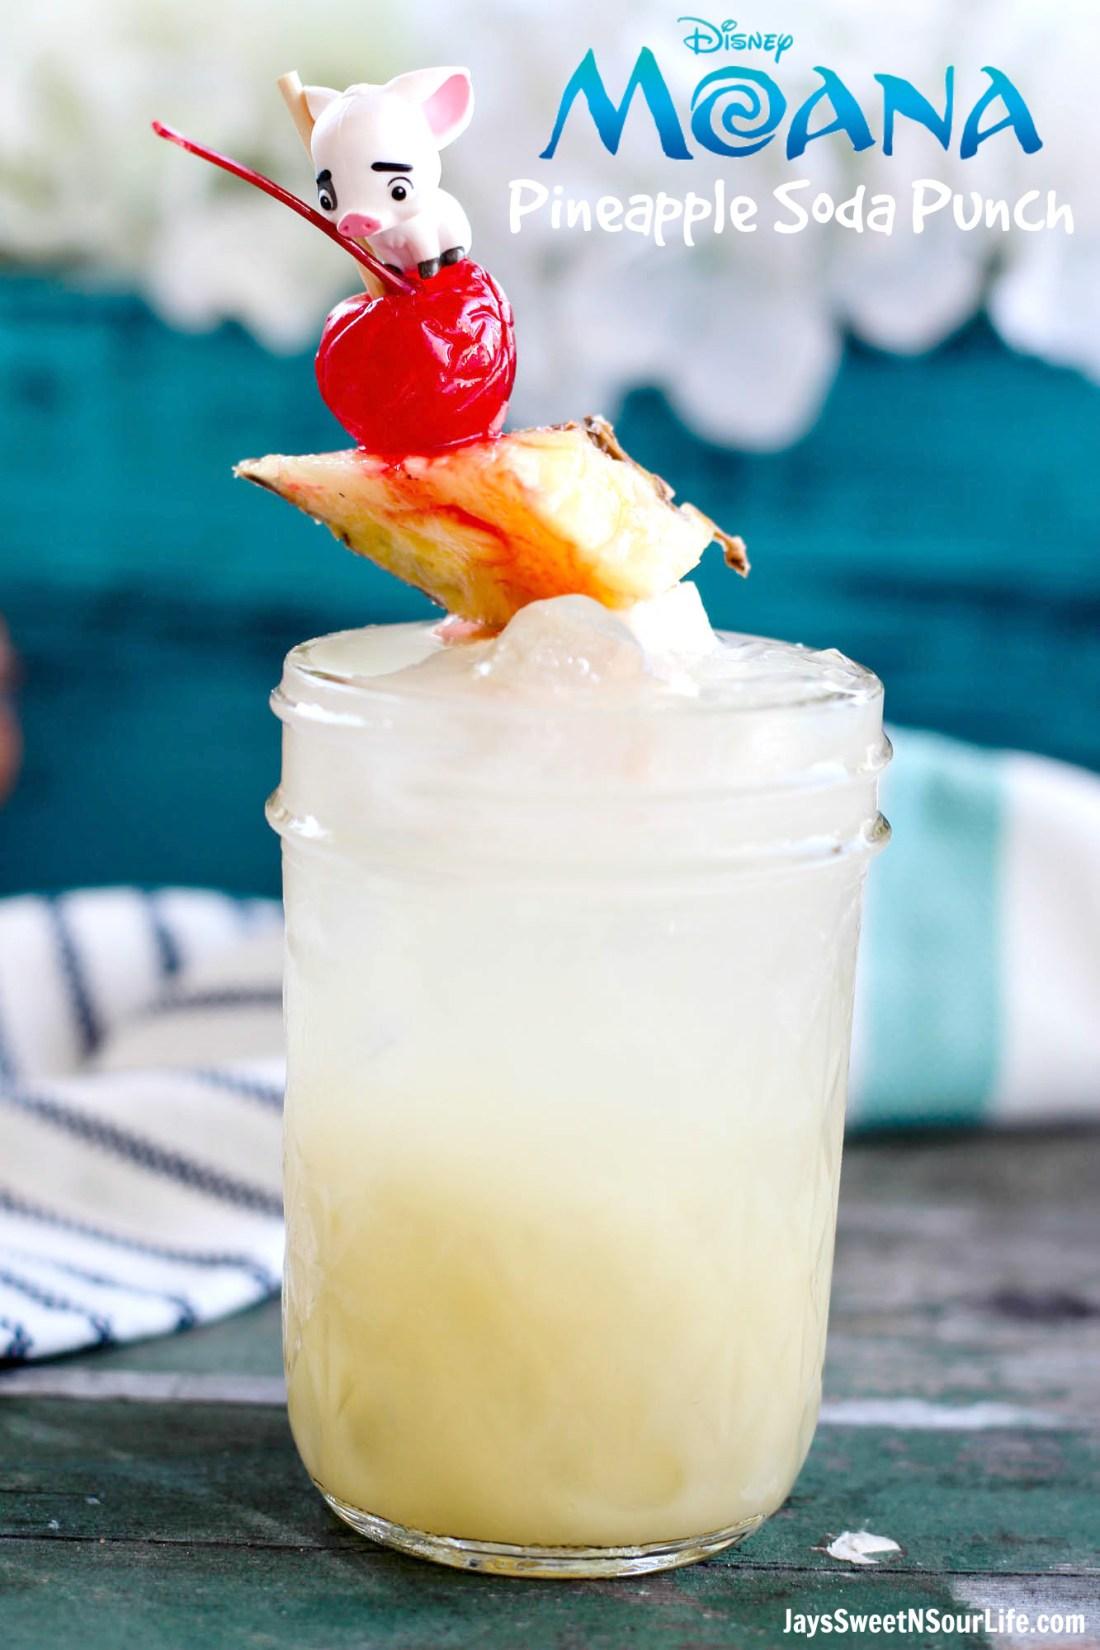 Moana Pineapple Soda Punch Recipe! Perfect for Moana party! Plus more Moana craft and recipe ideas!